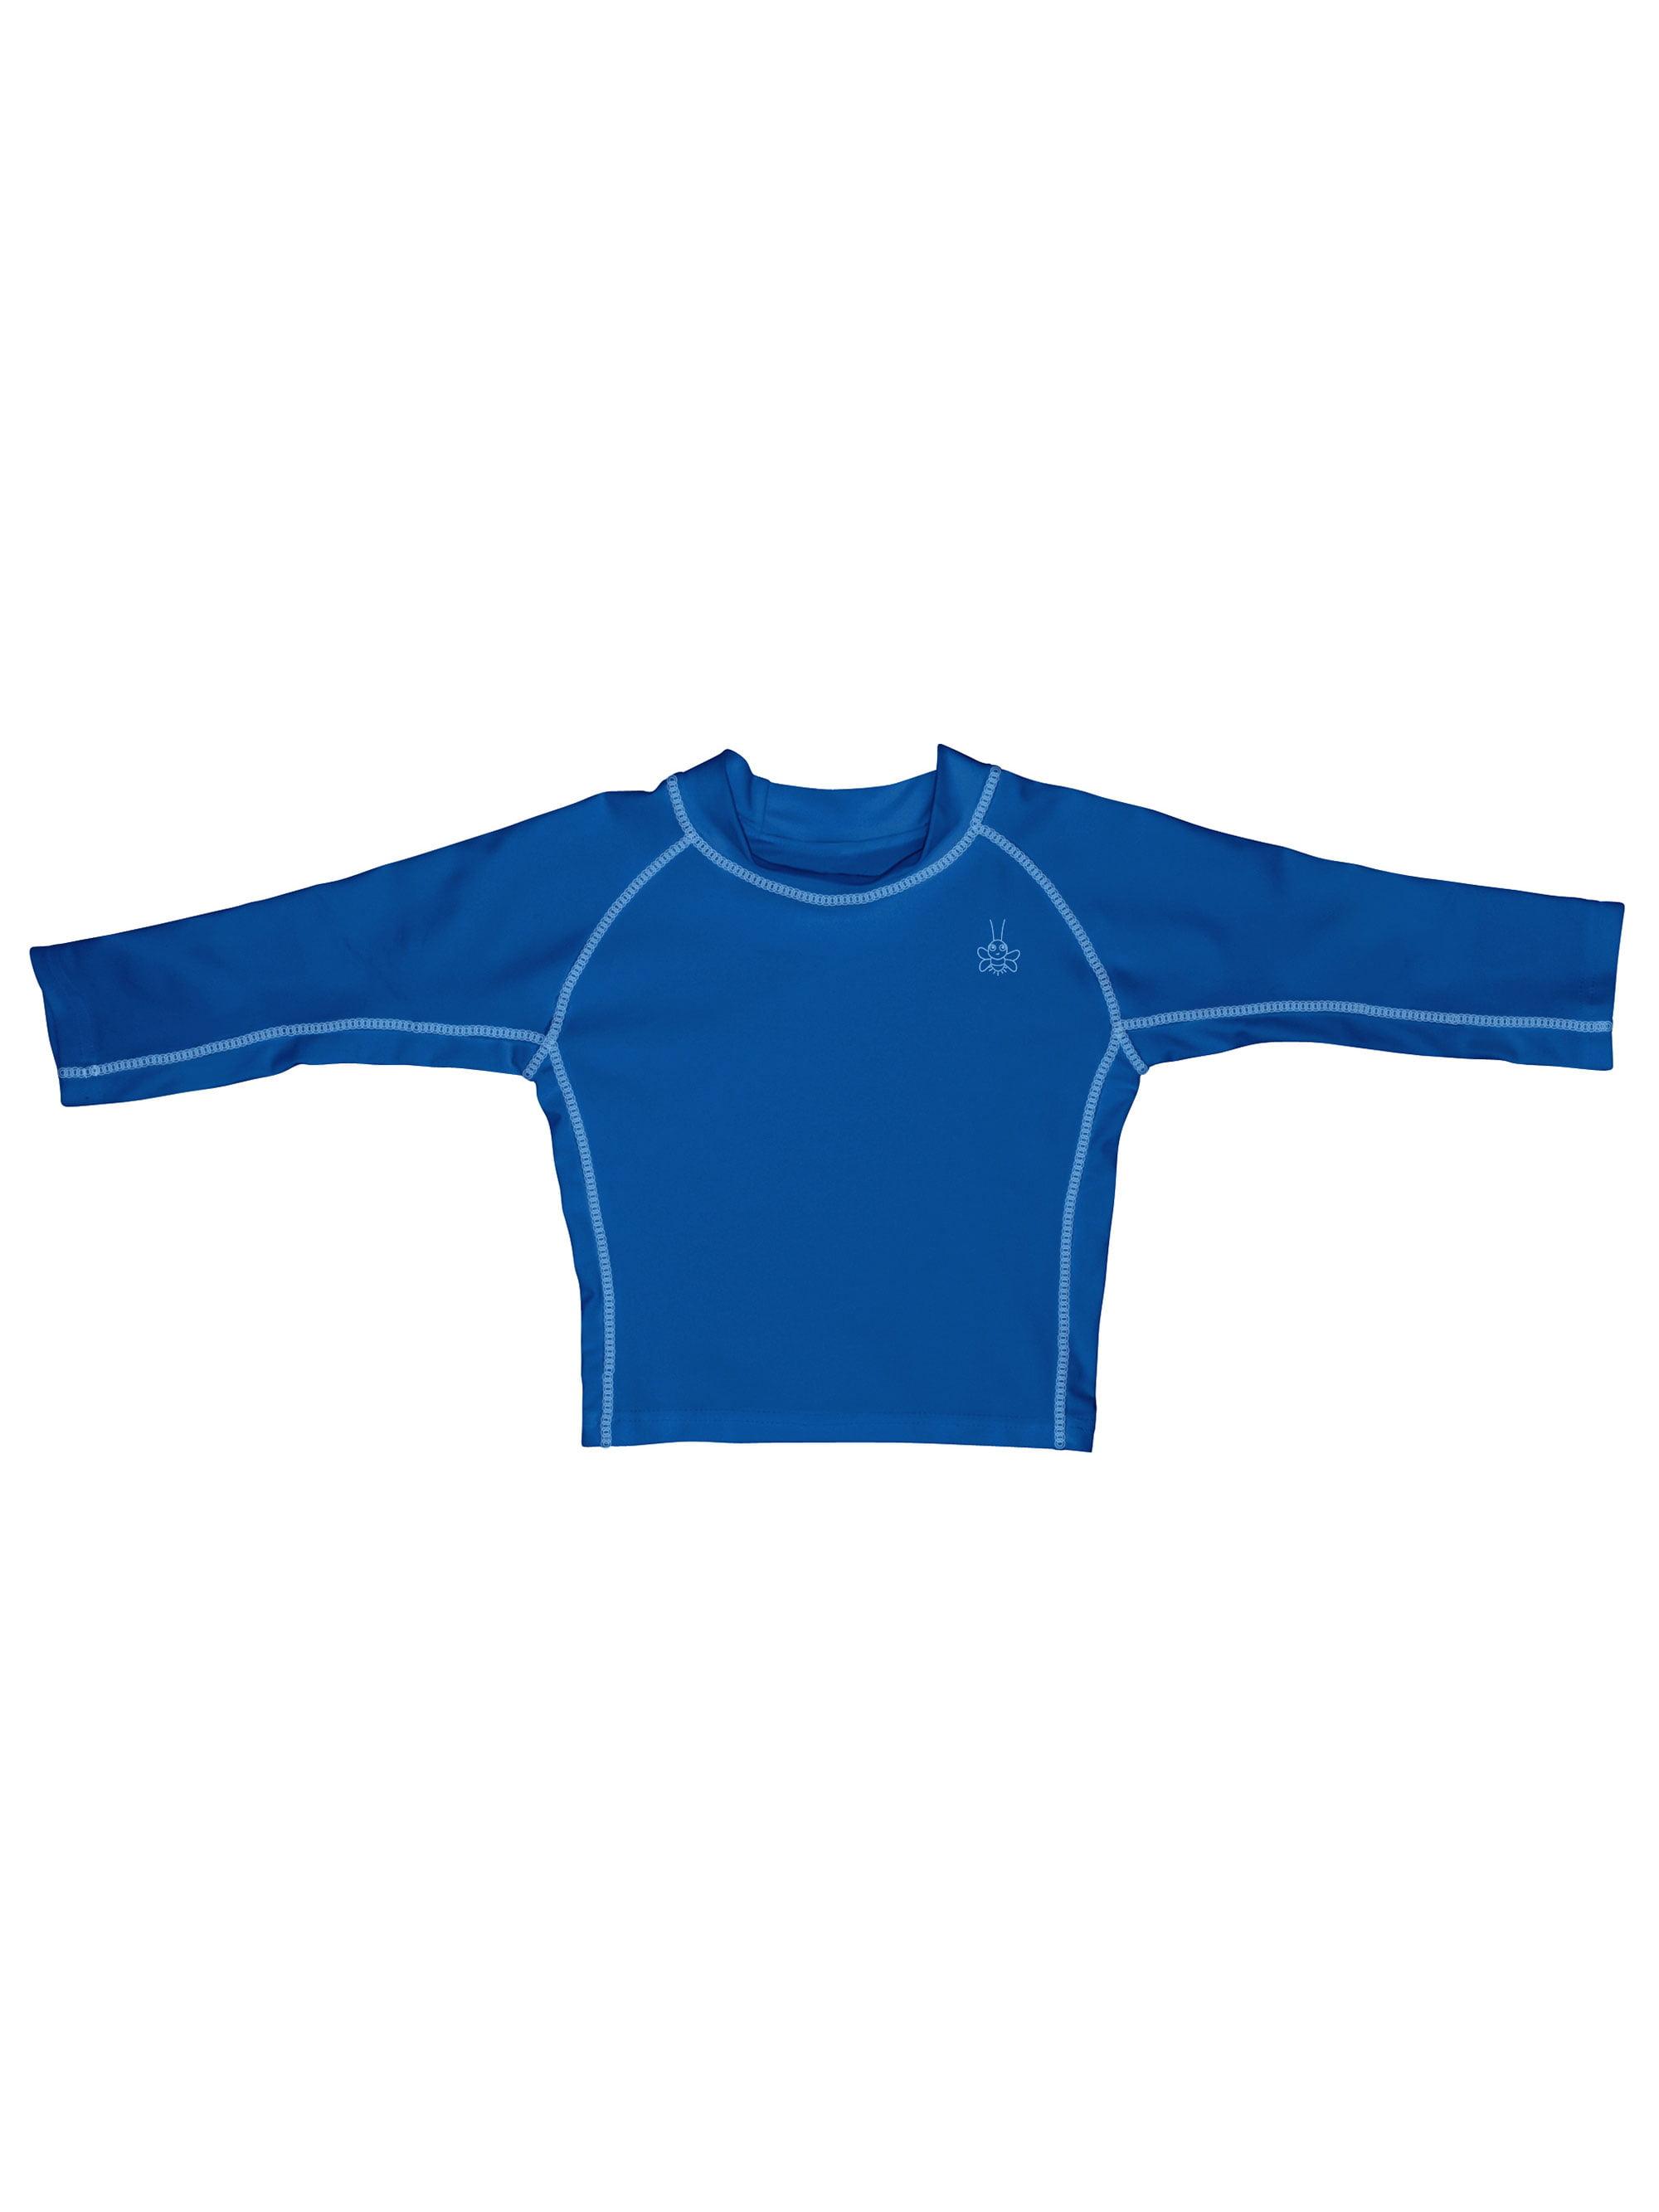 Beach Brothers Men/'s L Royal Blue Long Sleeve Rash Guard Swim Shirt UPF 50